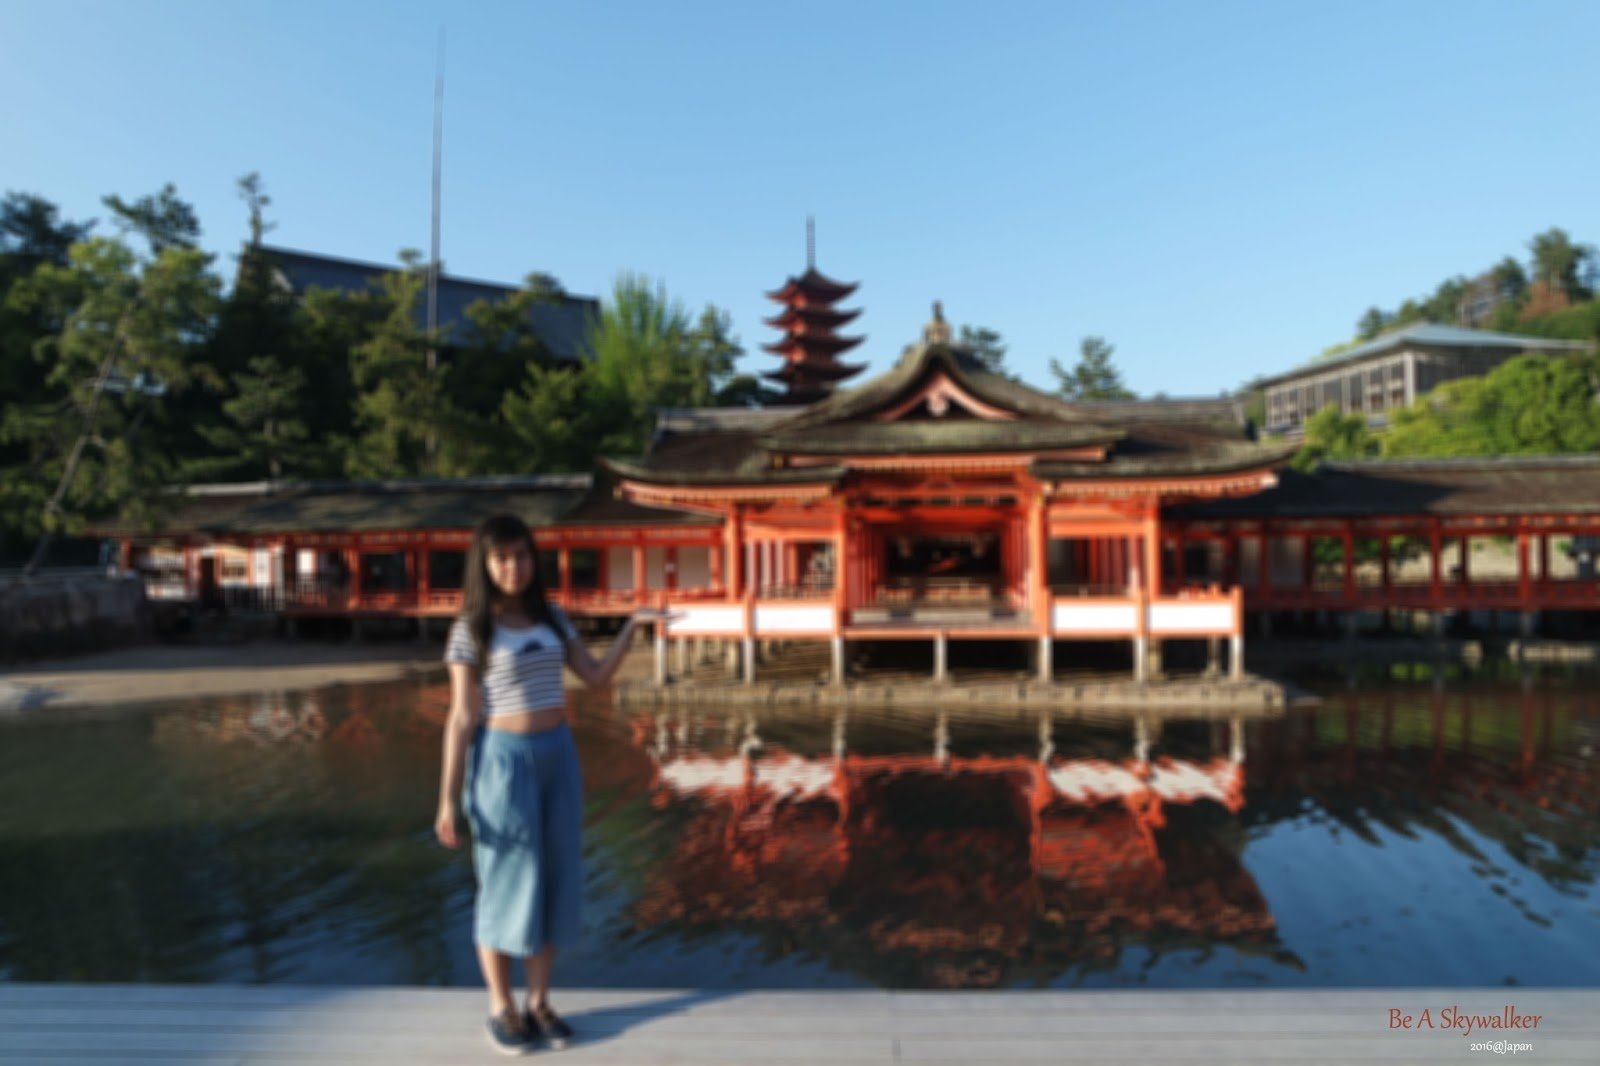 Be A Skywalker宮島一日遊Miyajima  海上大鳥居和嚴島神社 廣島京阪12日之旅